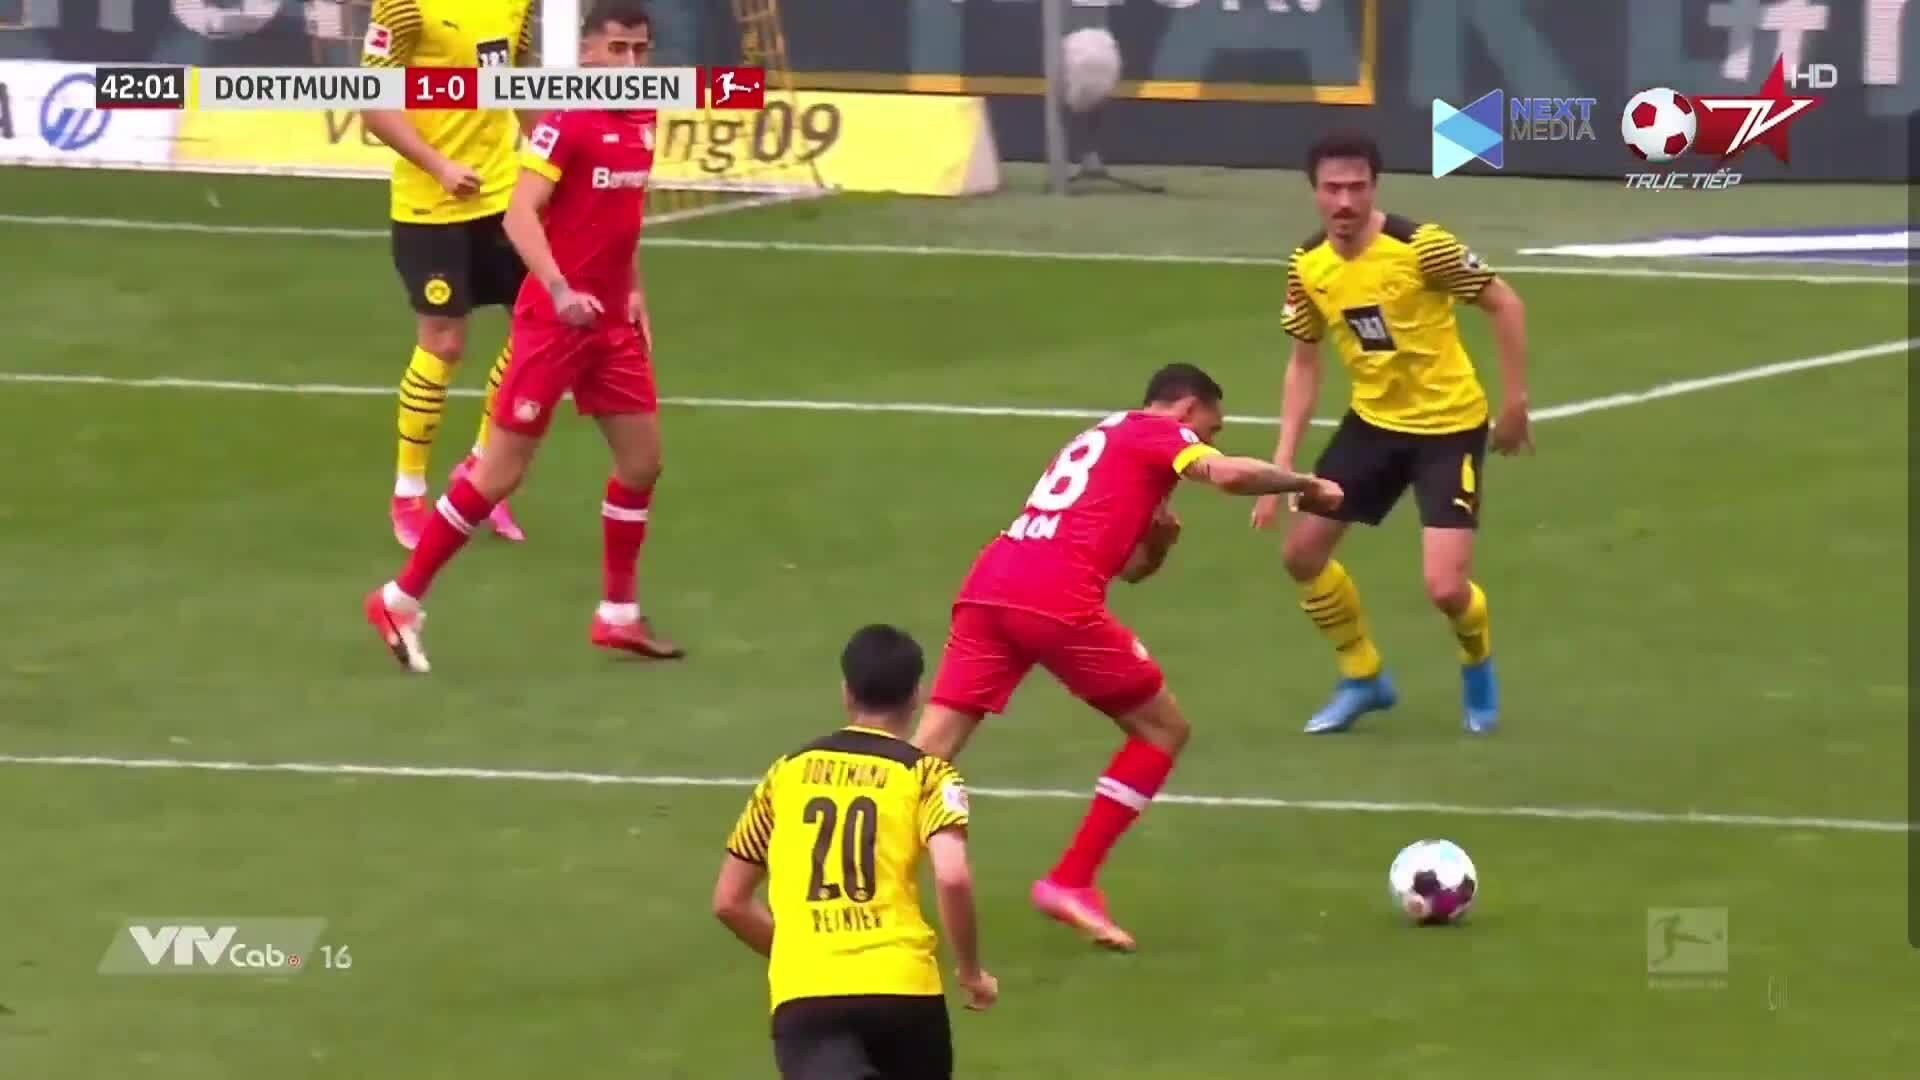 Dortmund 3-1 Leverkusen